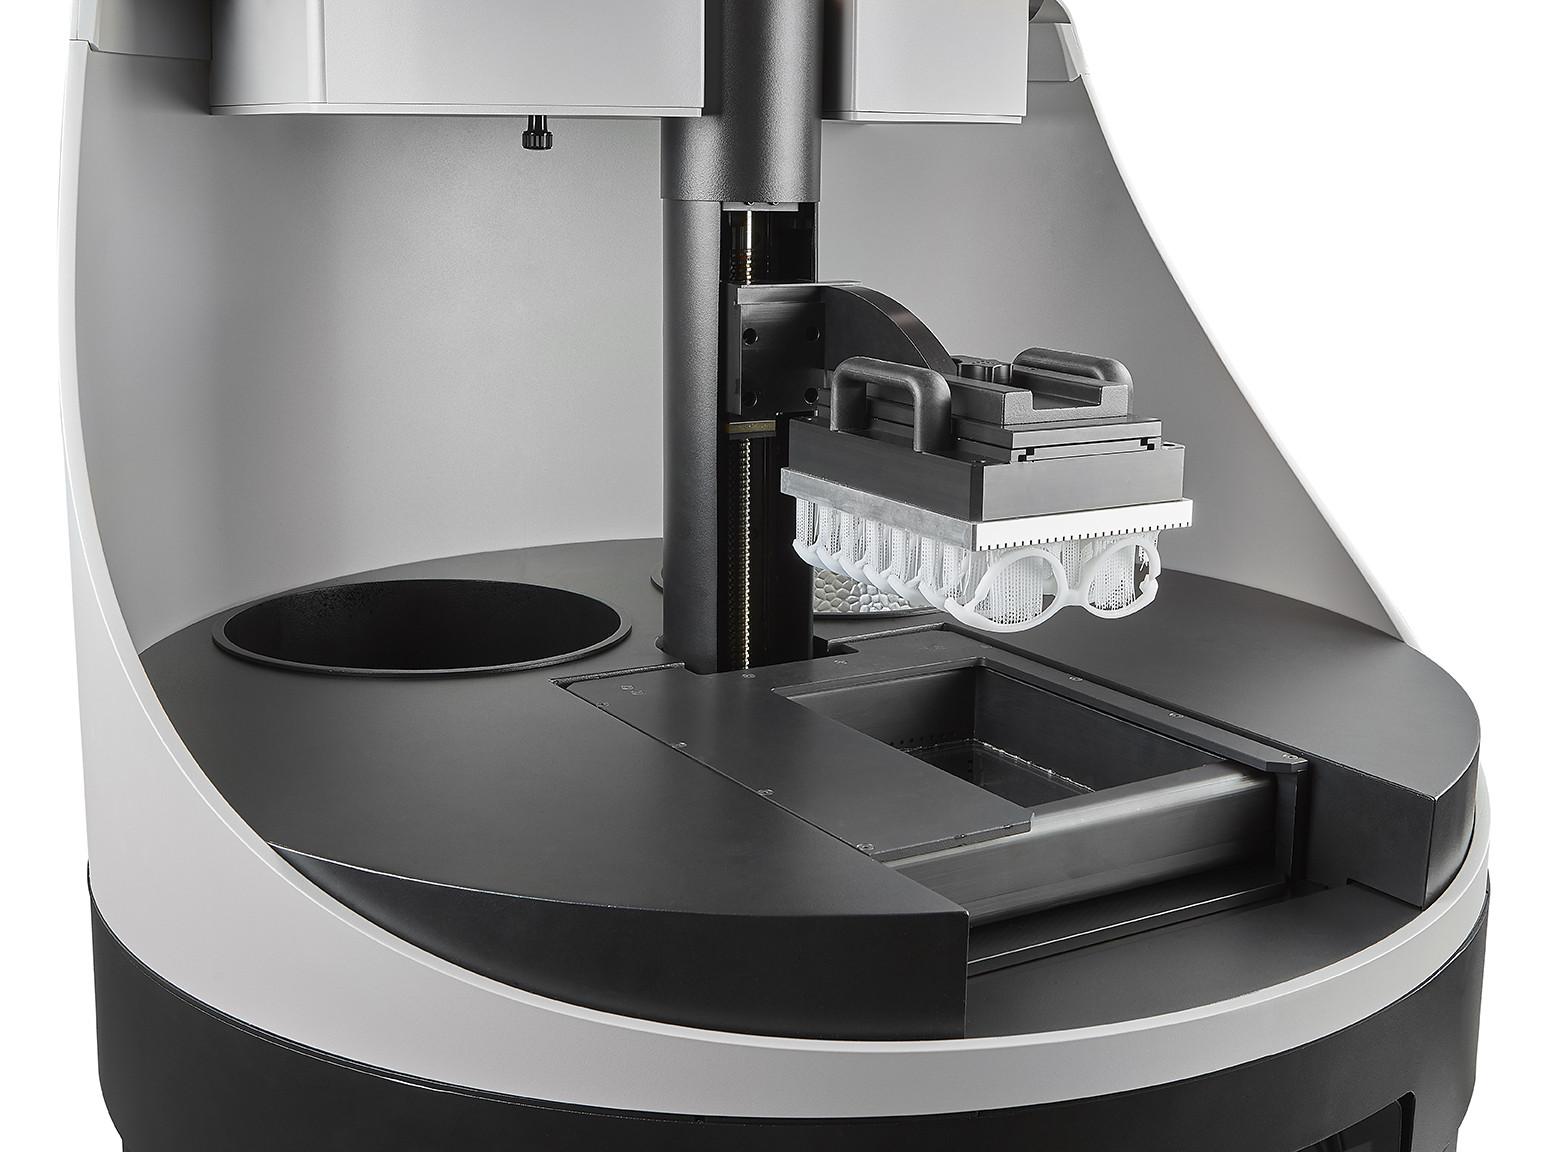 Best ideas about DIY Sla Printer . Save or Pin Designer Creates a DIY SLA 3D Printer for Under $30 Minus Now.